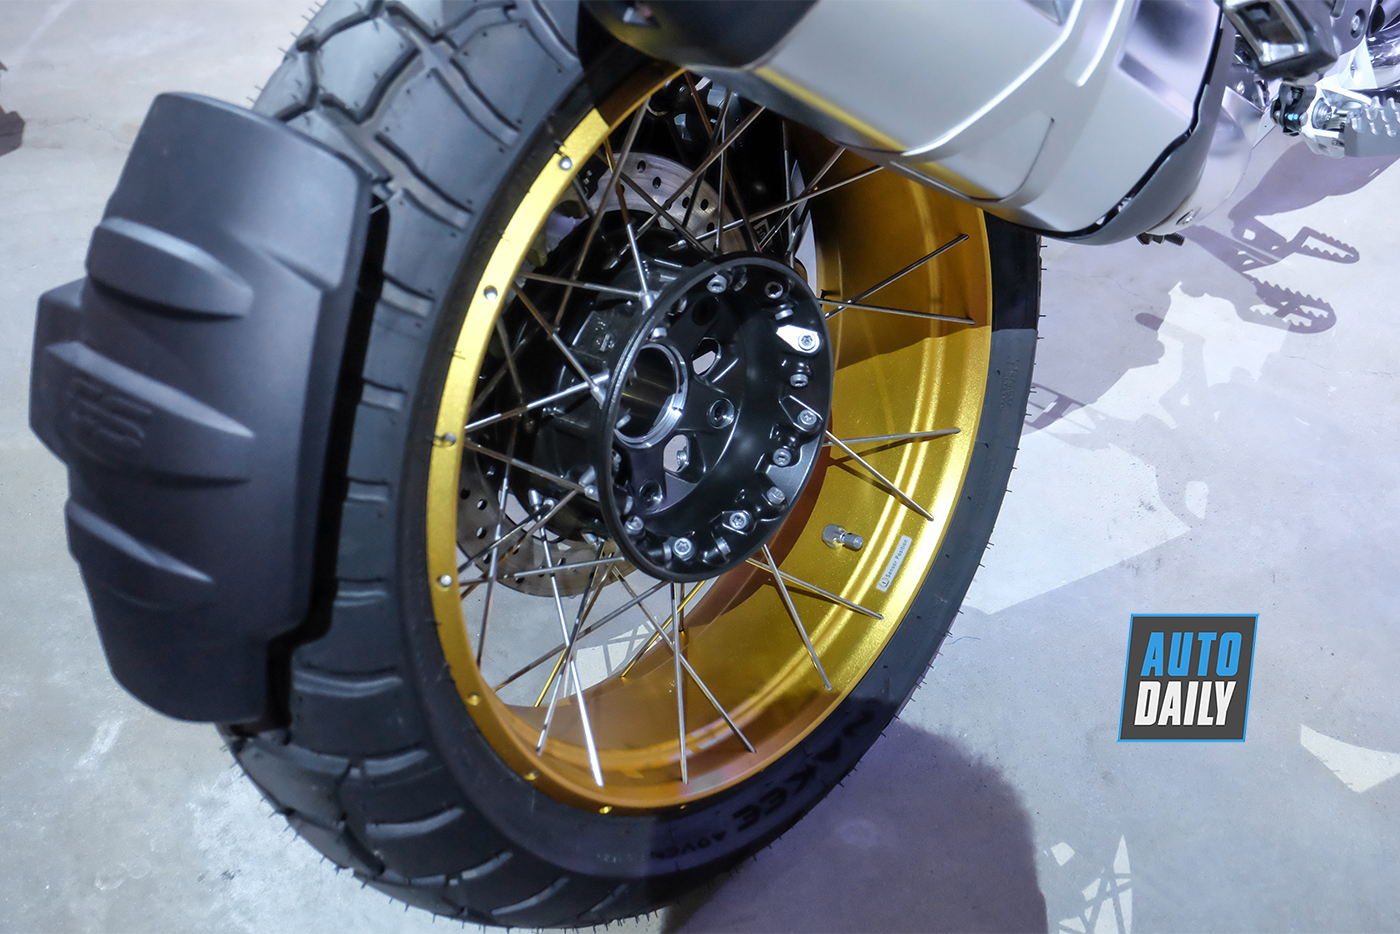 bmw-motorrad-r-1250-gs-2019-15.jpg